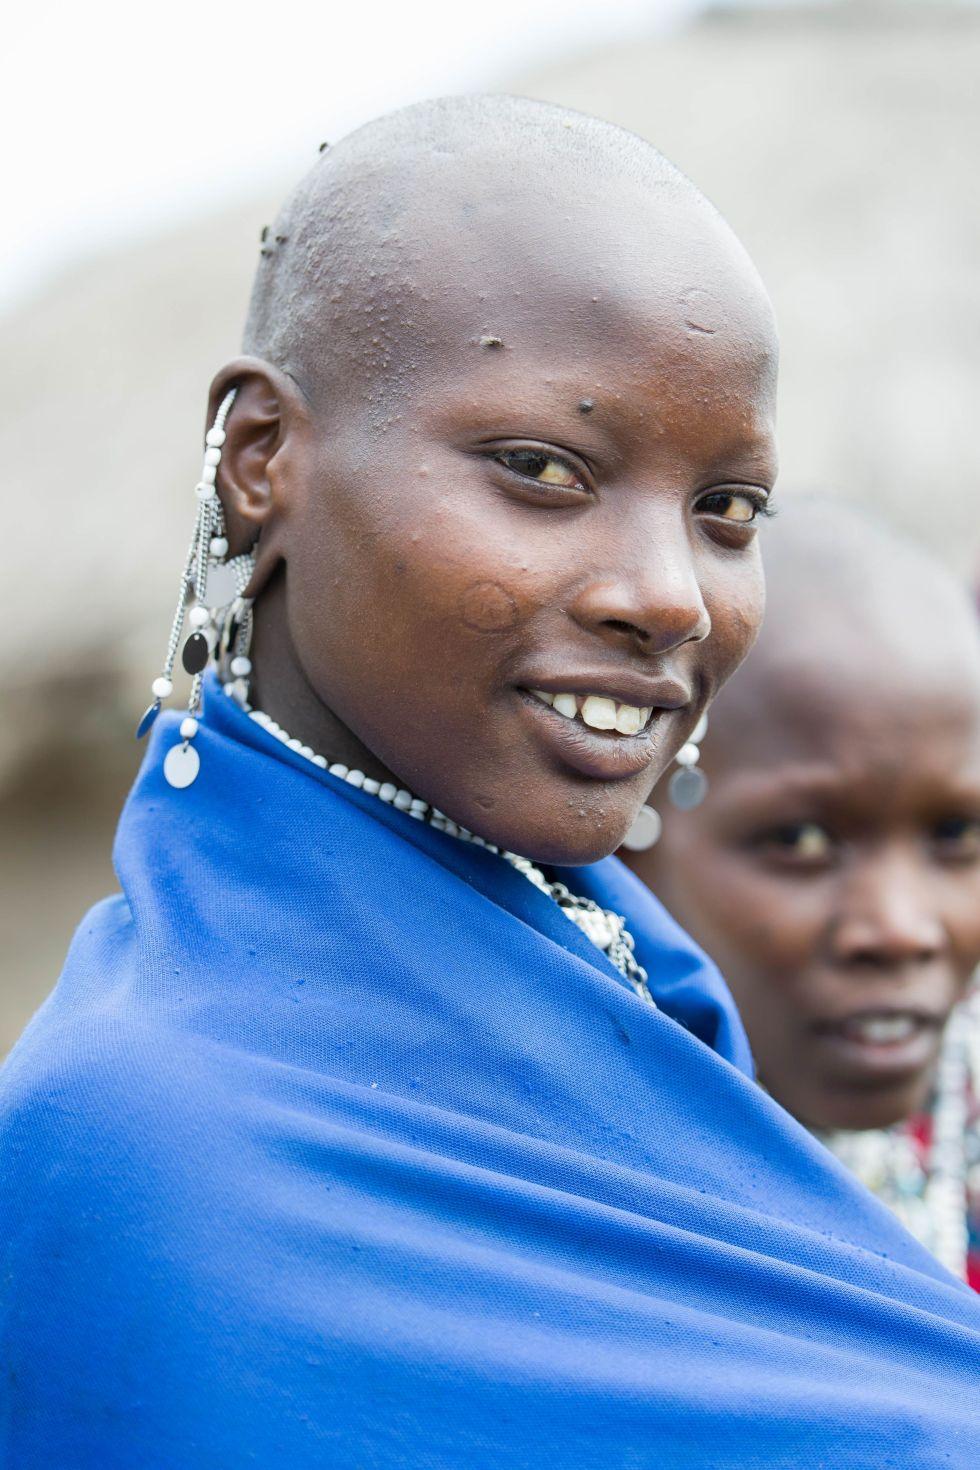 Kodres O'Brien, Sarah_Tanzania 3